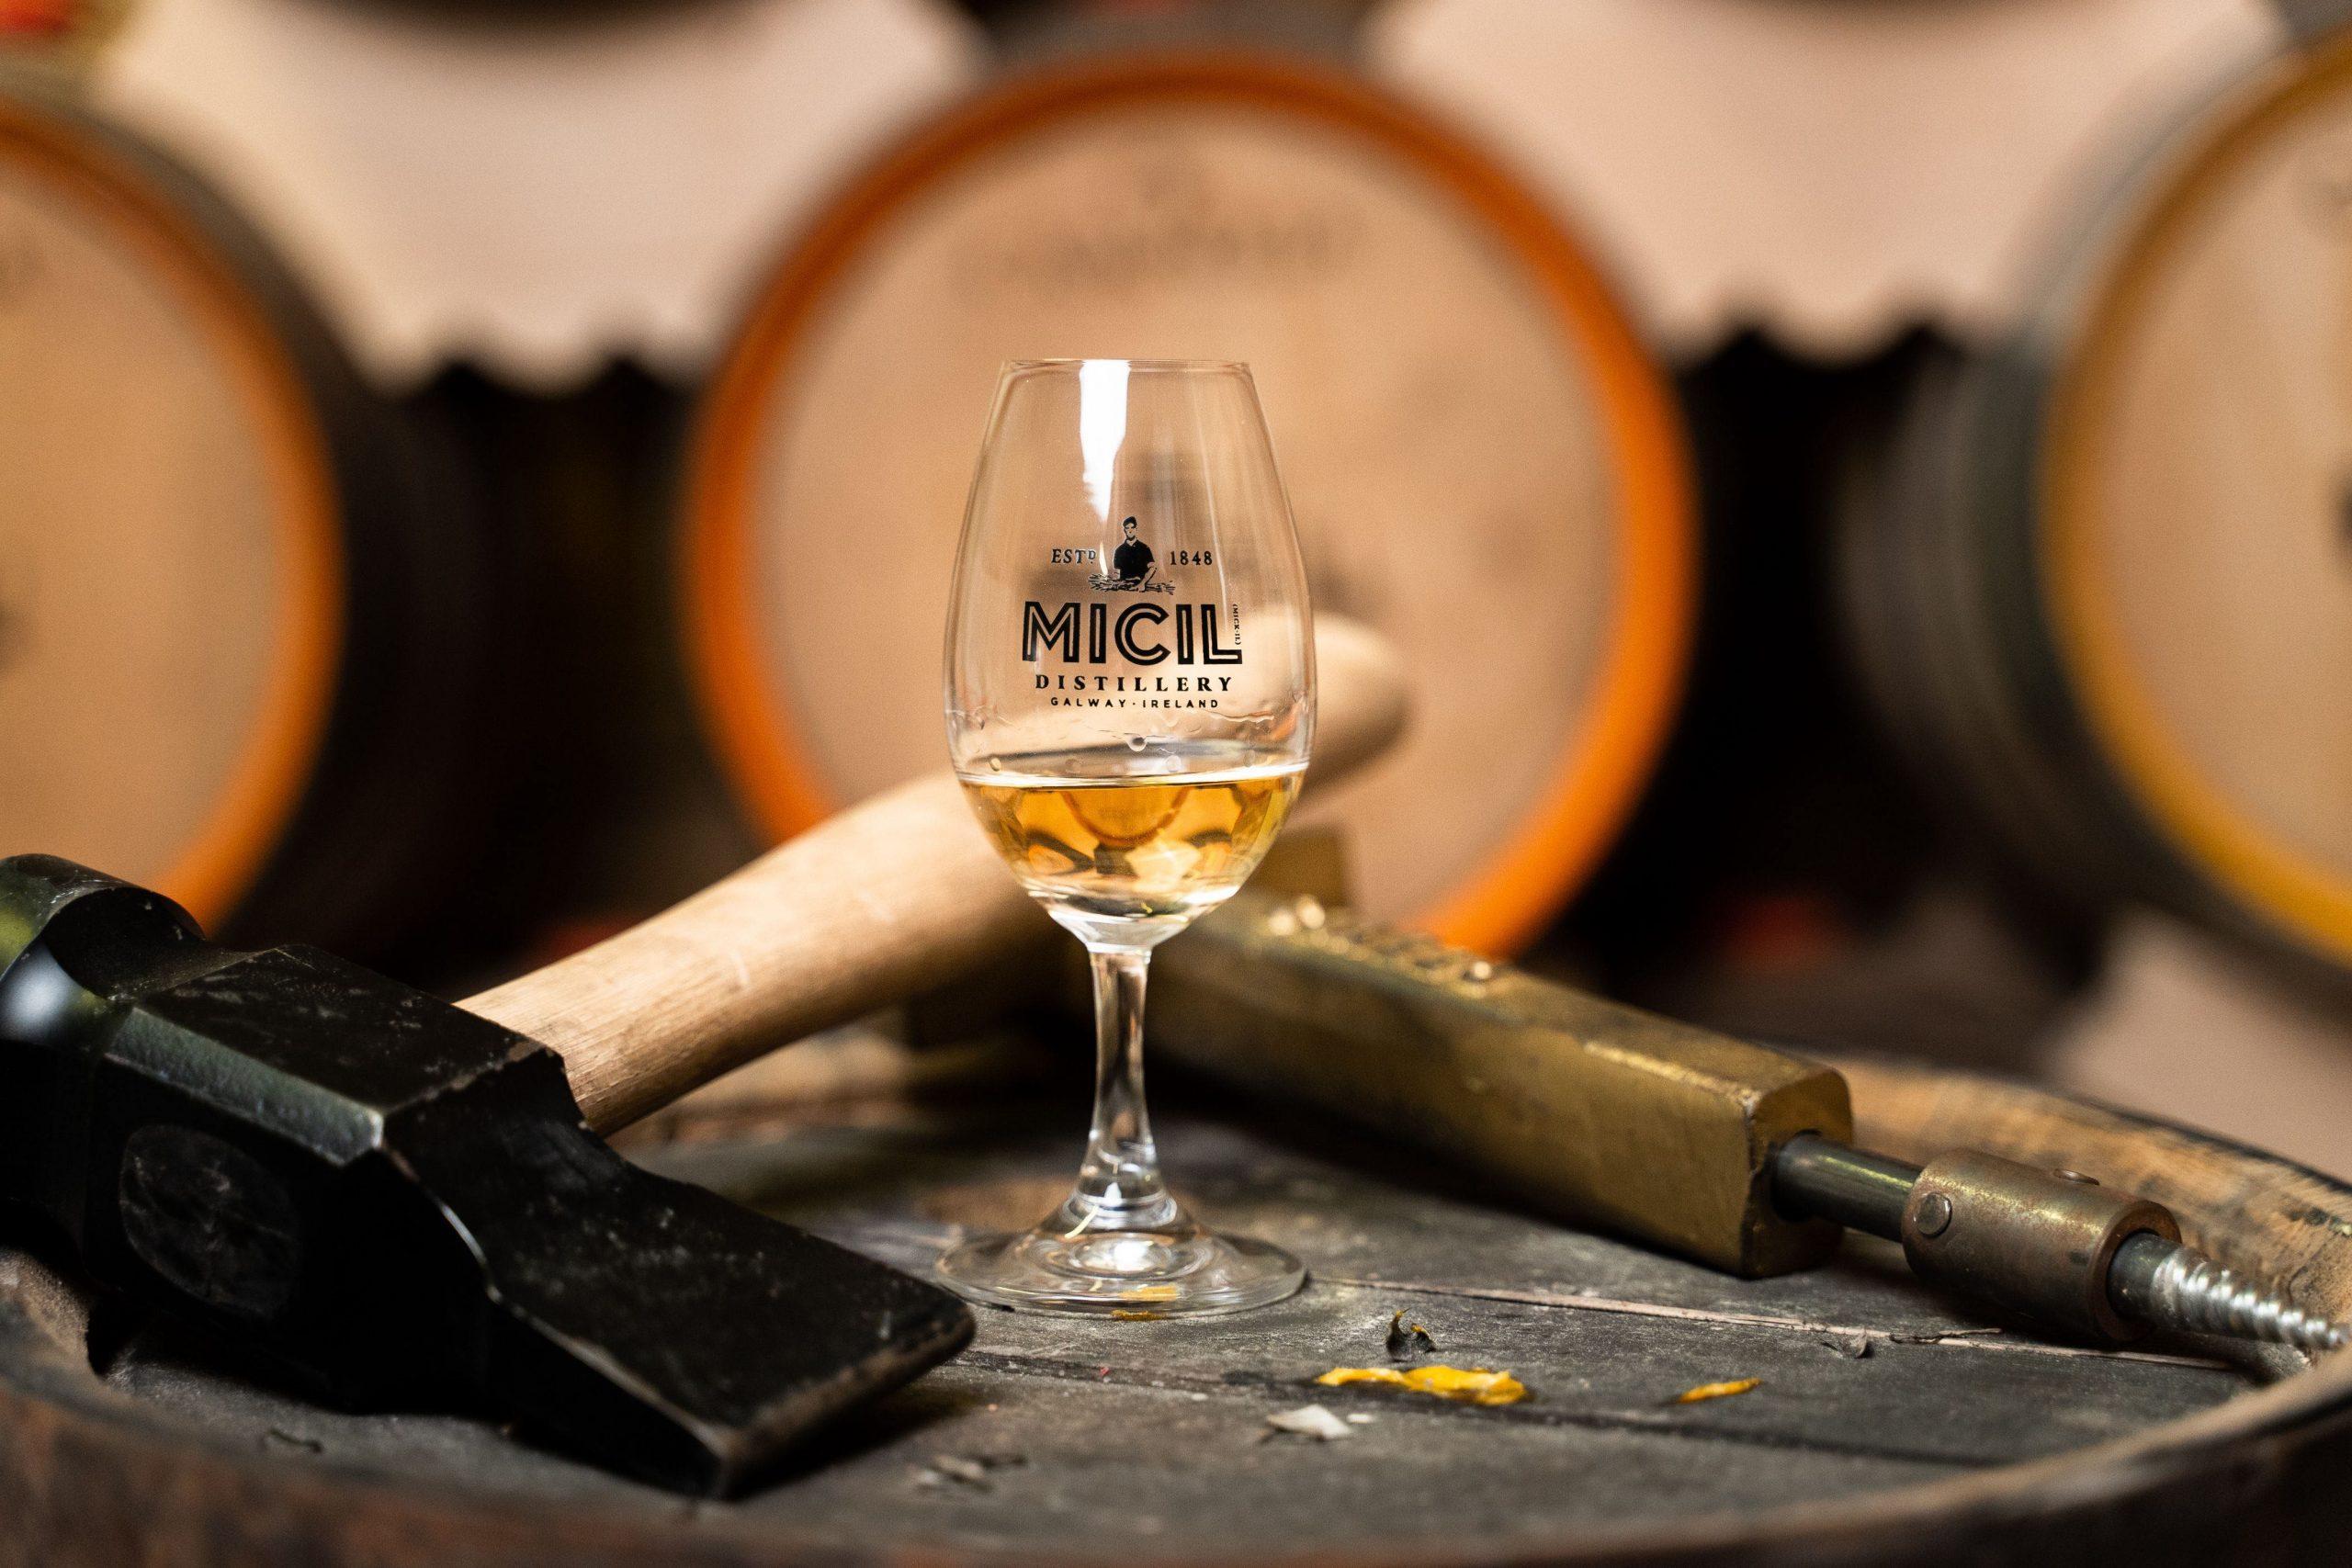 Padraic O'Griallais Micil Distillery Irish Whiskey Blogger Stuart Mcnamara Galway Whiskey Connemara